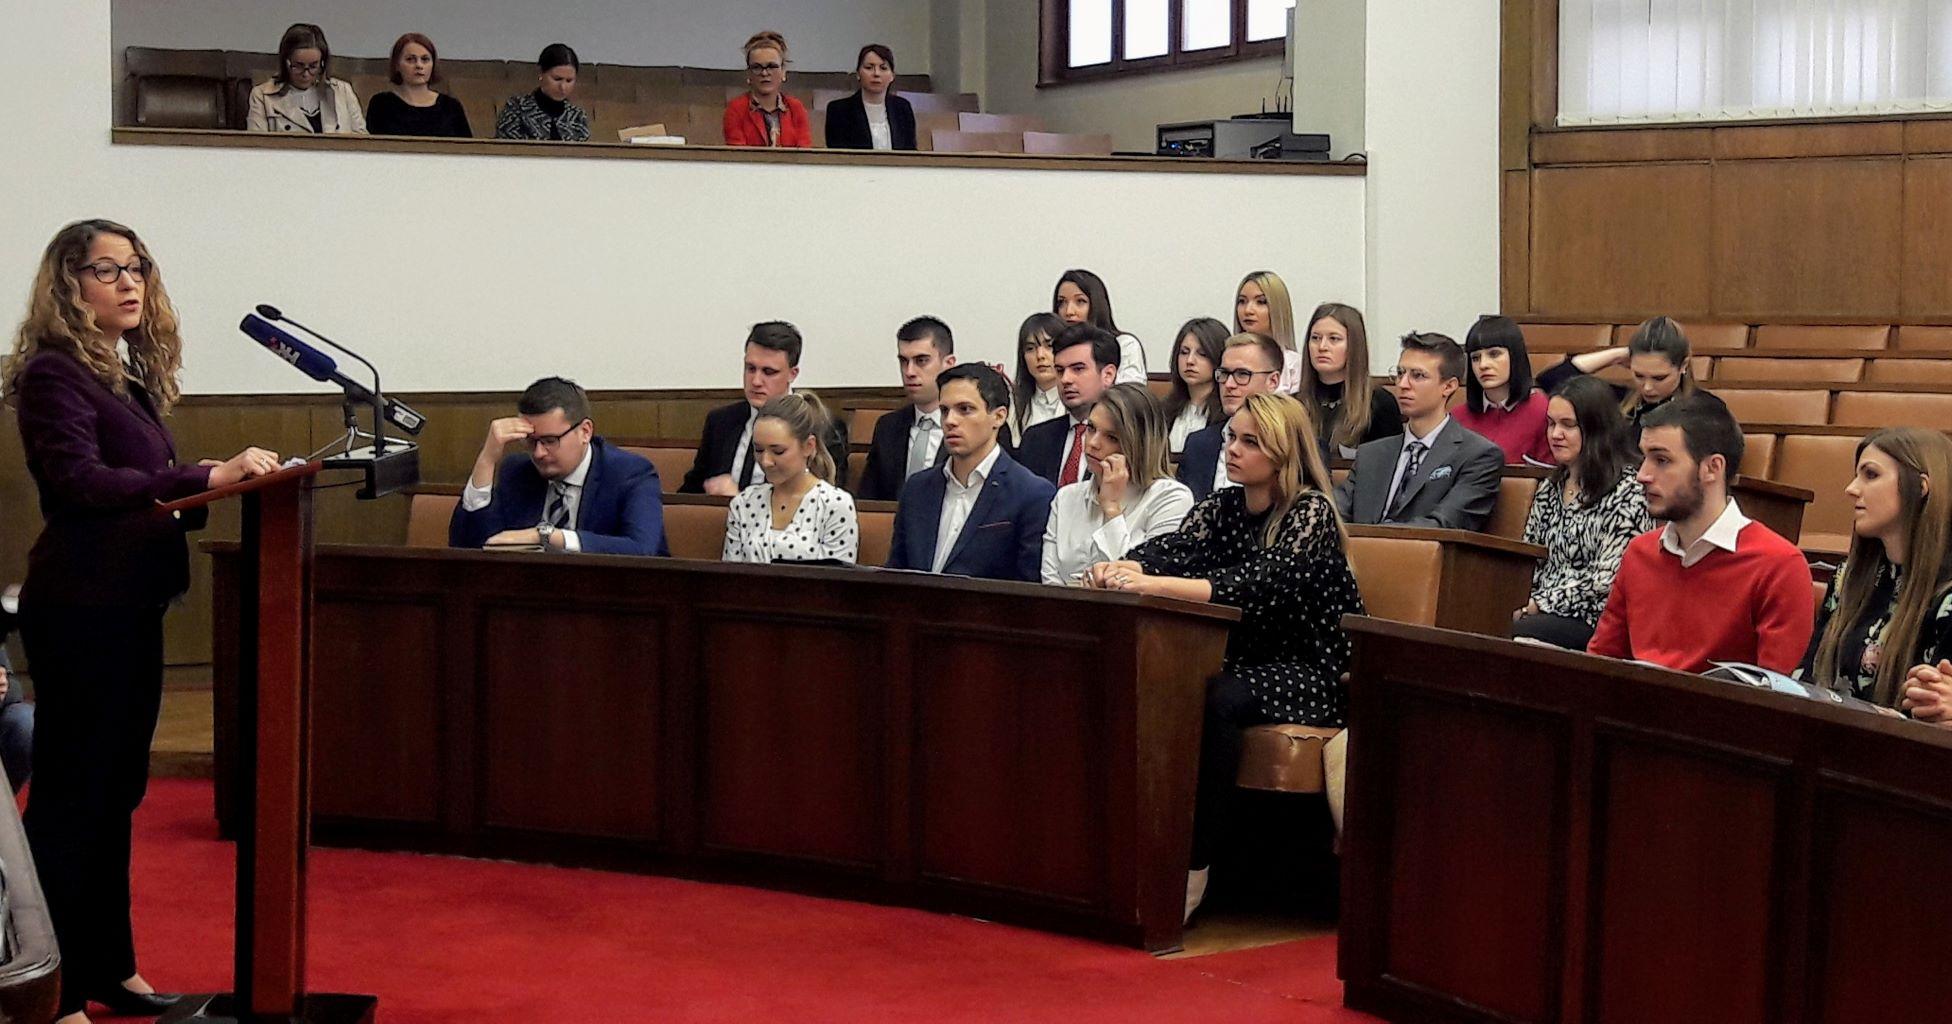 Croatian ELSA organised moot parliamentary session in Sabor